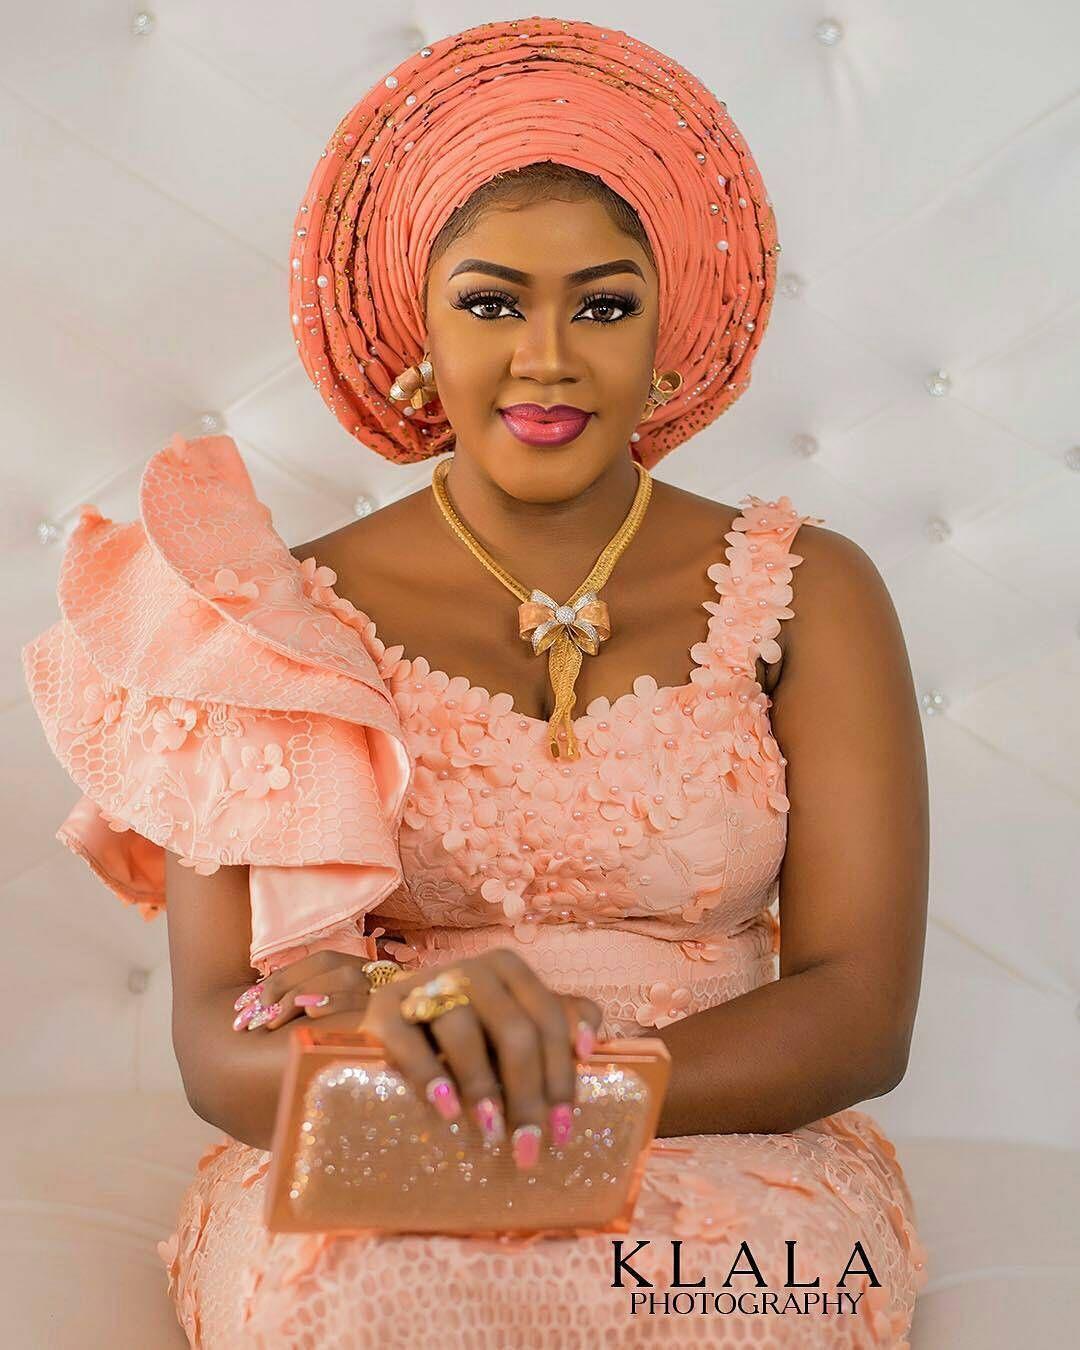 Wedding decorations nigeria october 2018 prettyfitboss klalaphotography Makeup beautifixx Native by